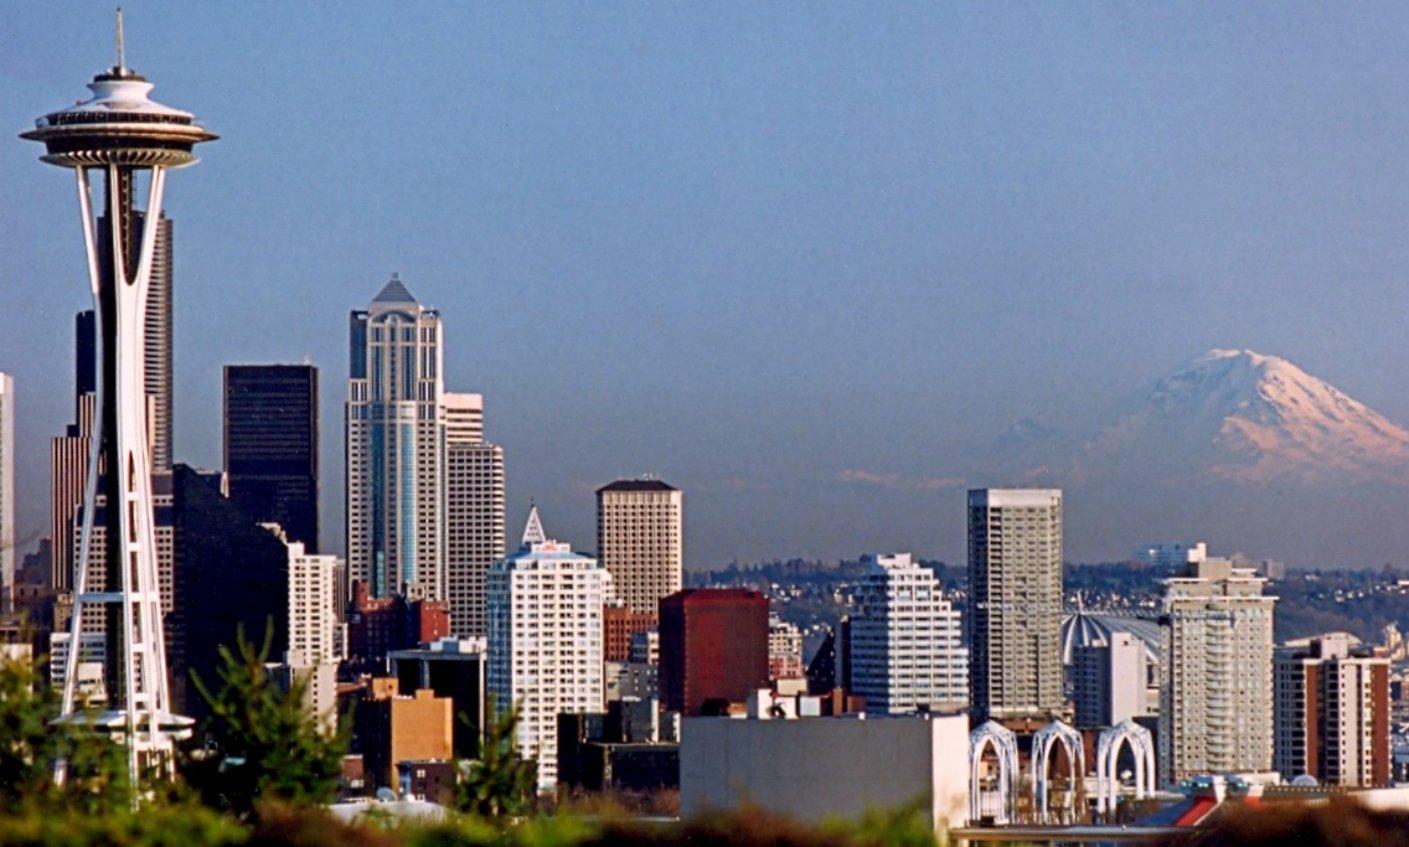 Seattle, WA Skyline with Space Needle